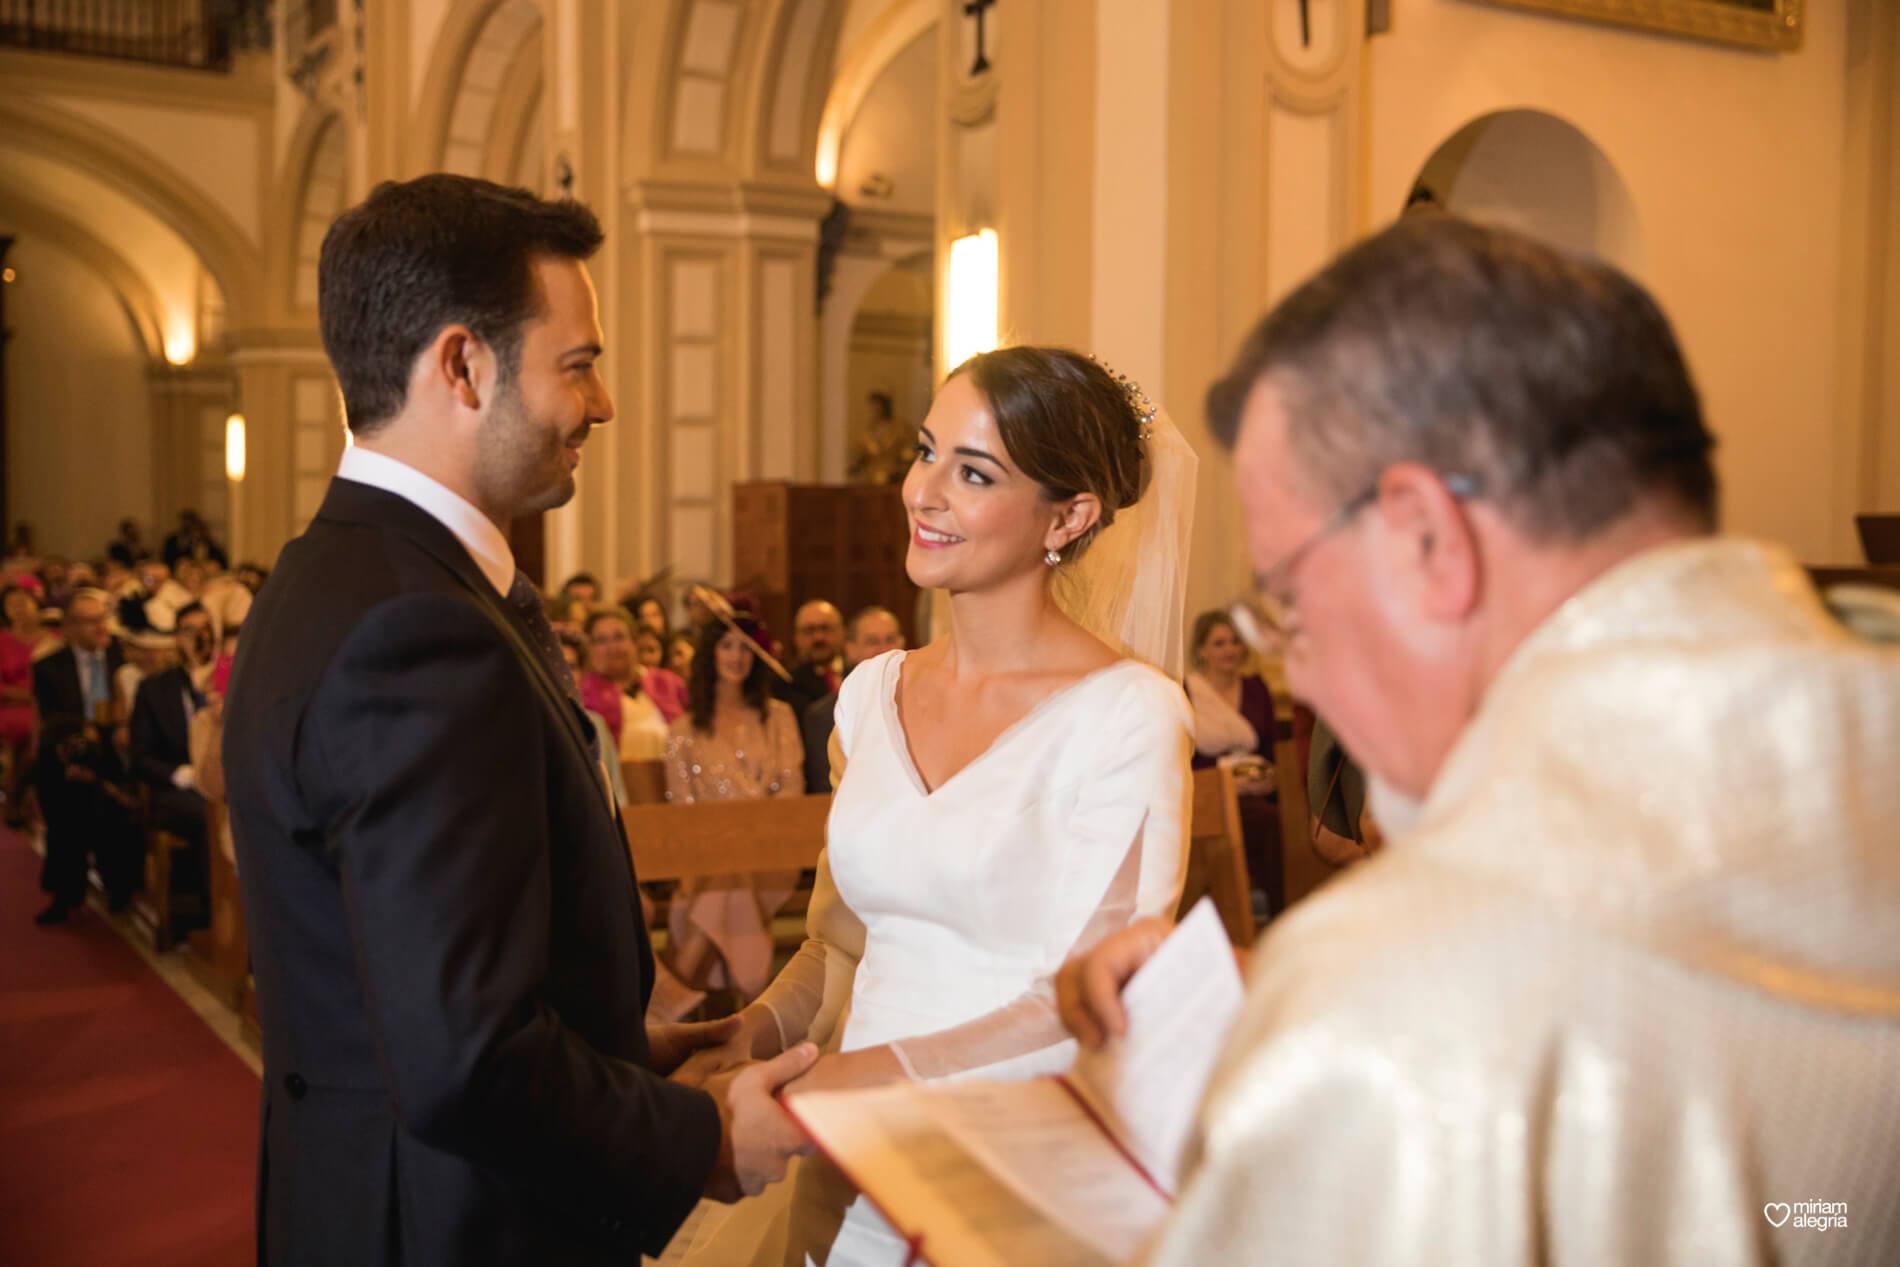 vestido-de-novia-paula-del-vas-miriam-alegria-fotografos-boda-murcia-56